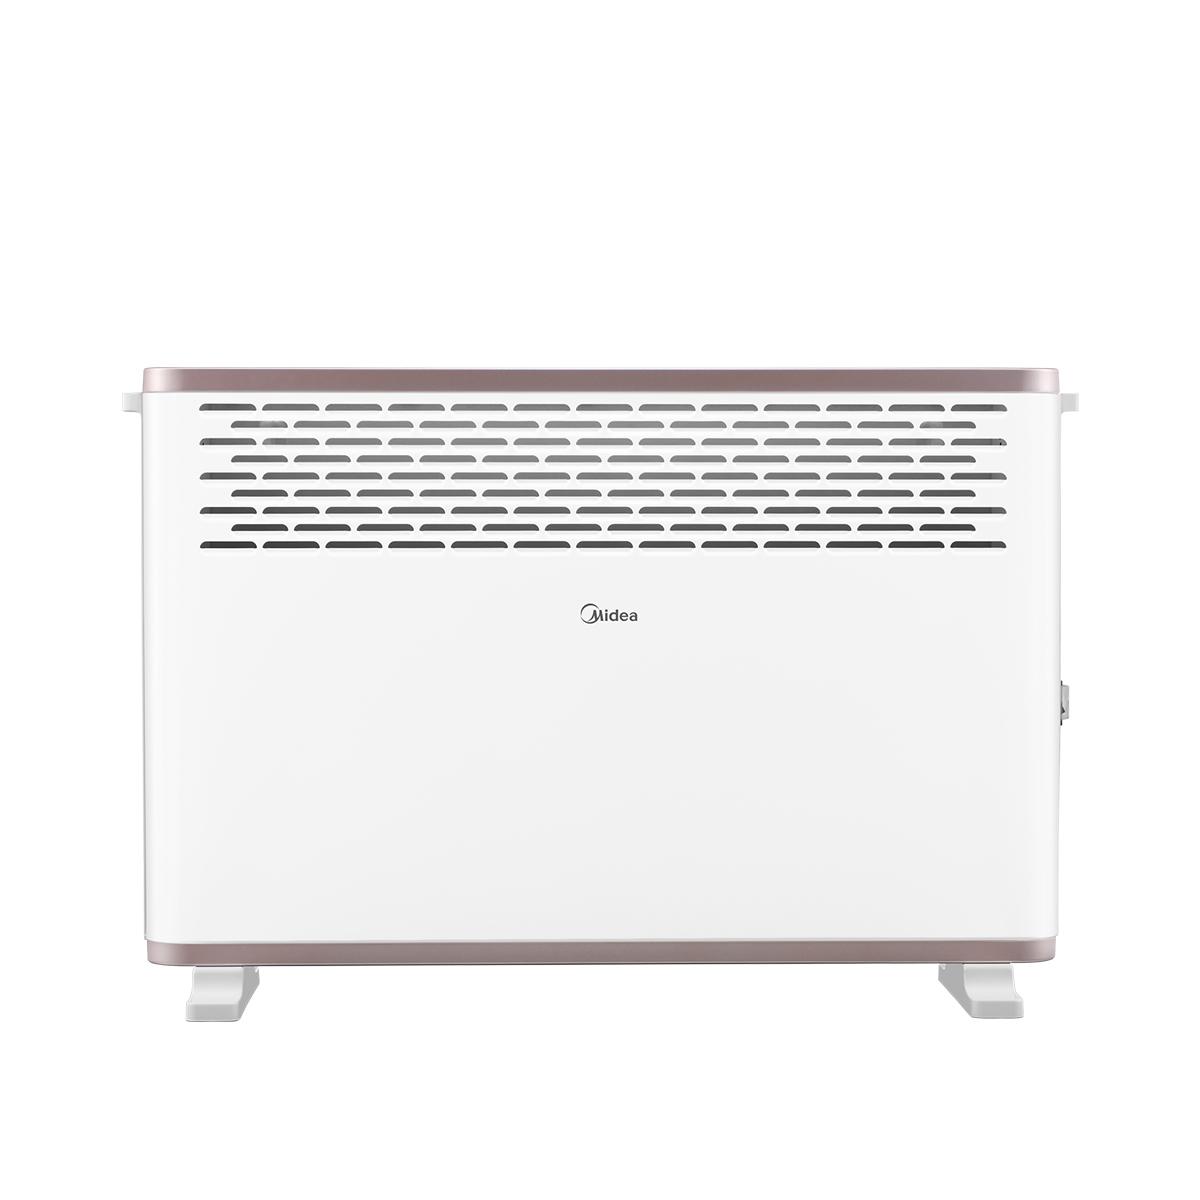 Midea/美的 HDY20K电暖器(油汀、暖风机) 说明书.pdf